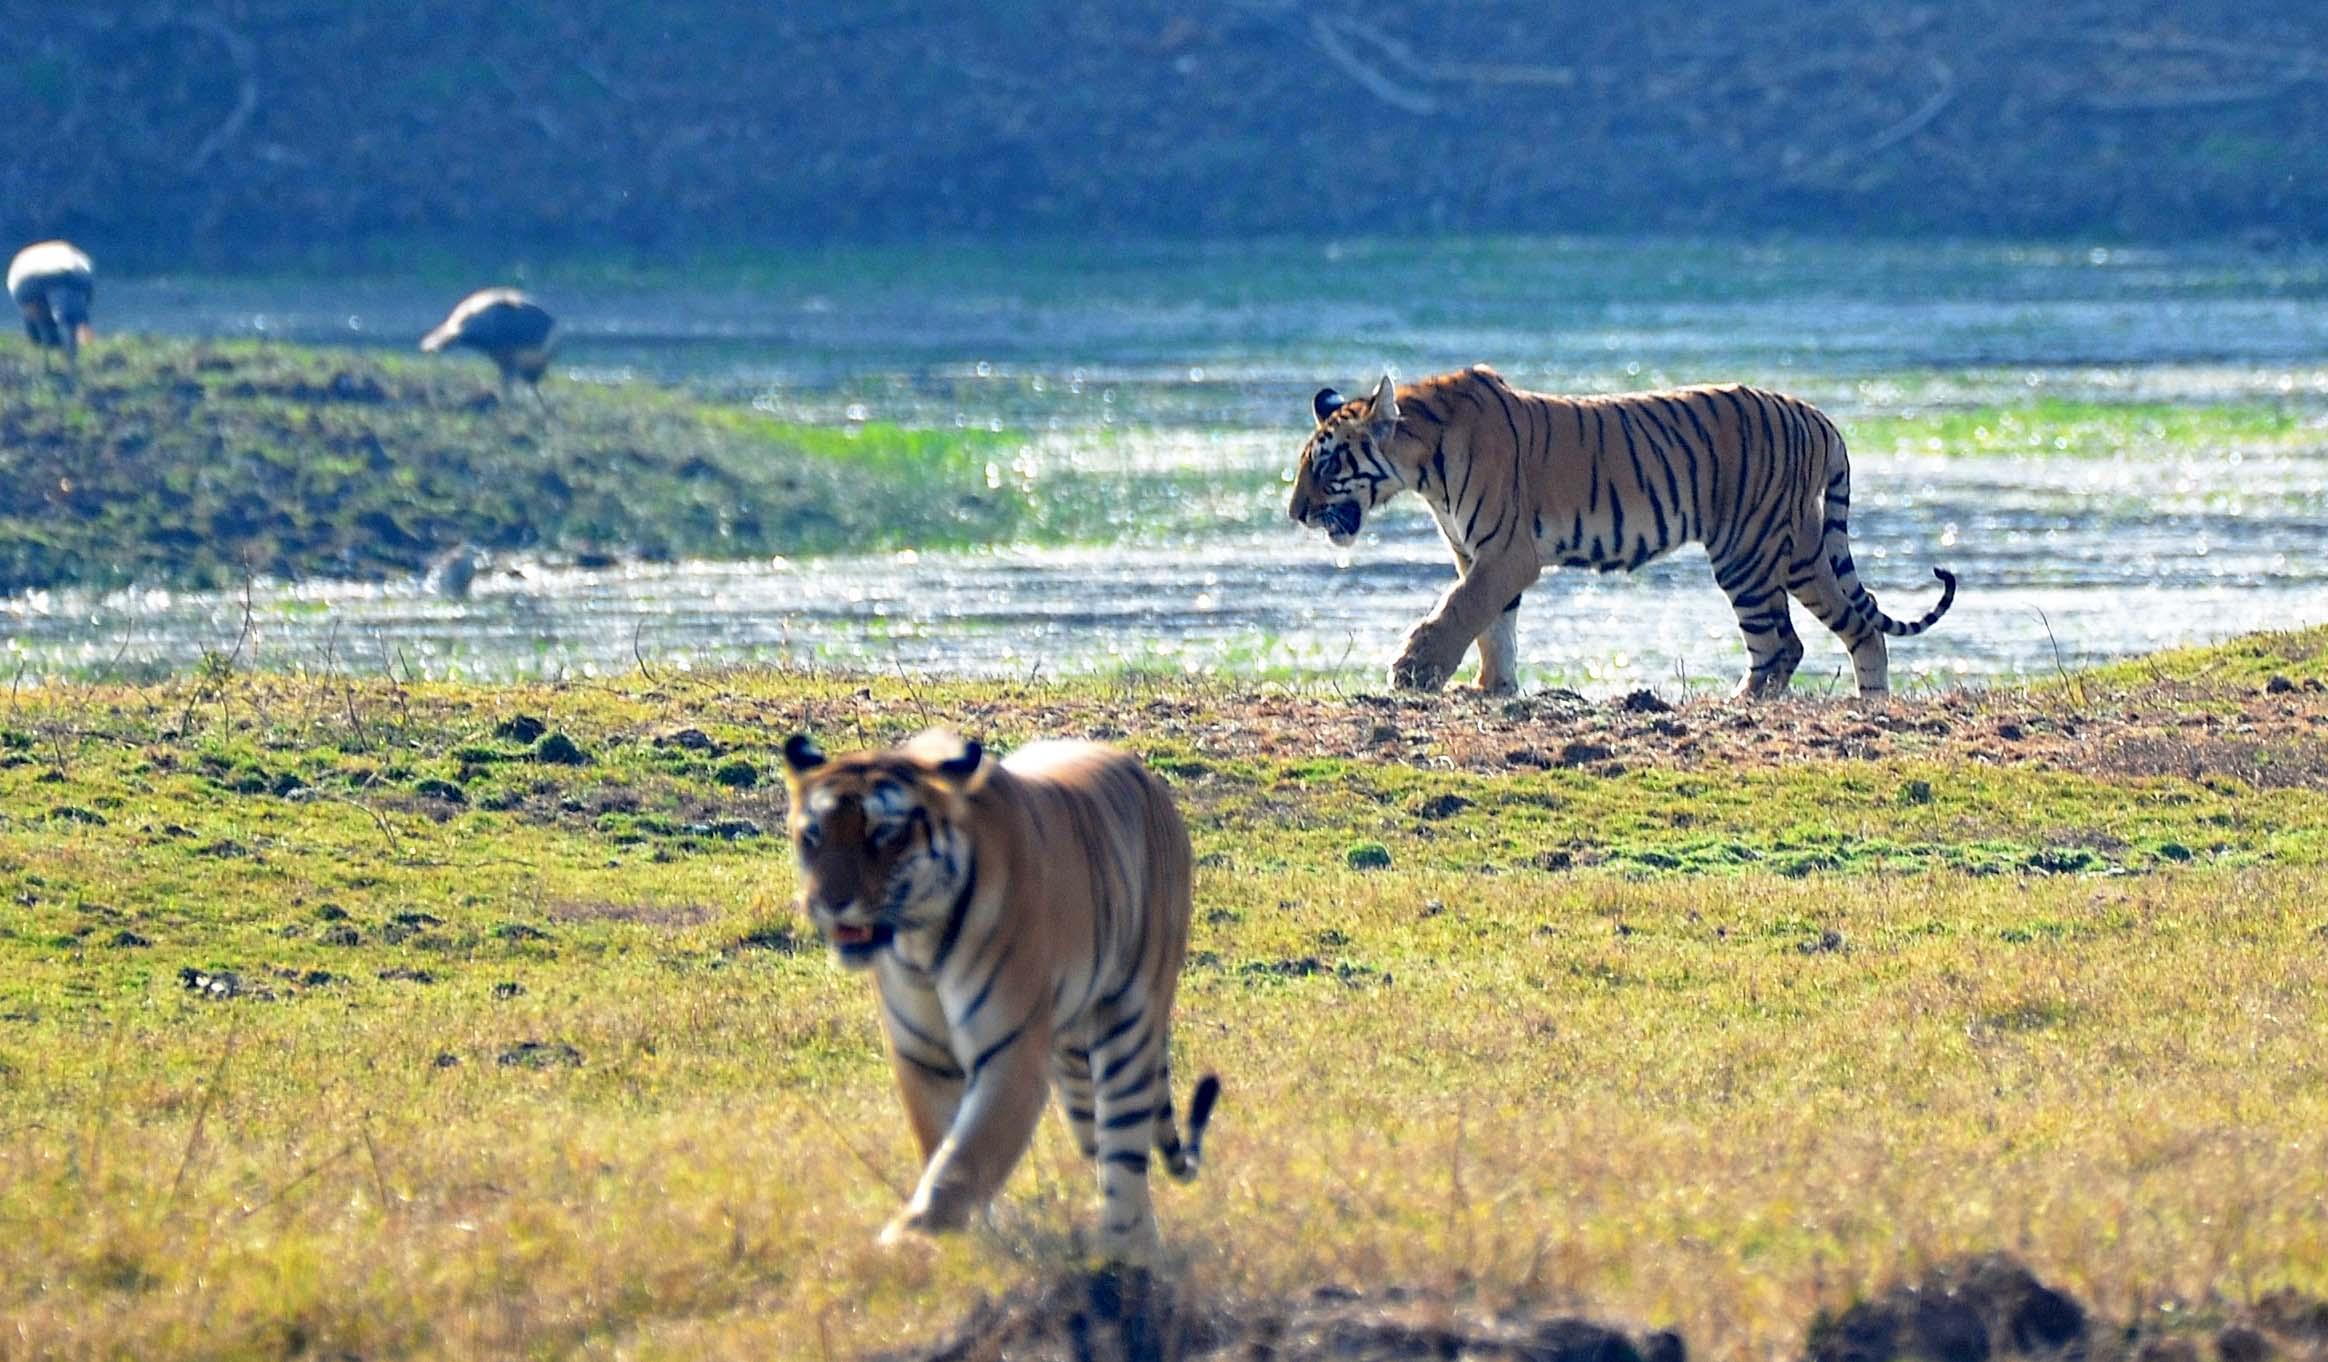 Tiger Cubs @ Tadoba